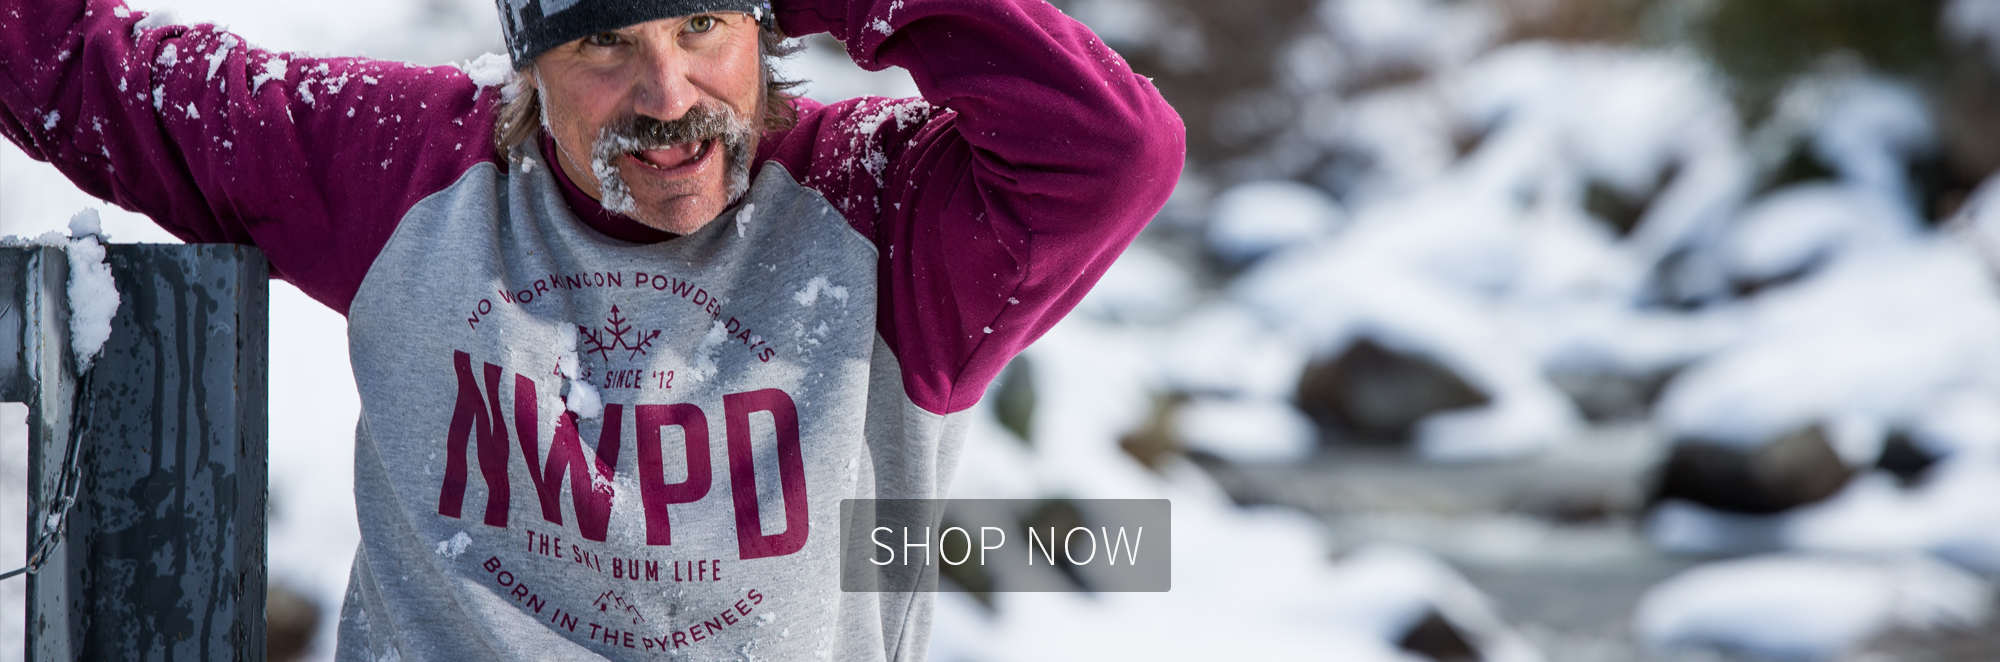 NWPD-Slide-19-sweaters-2